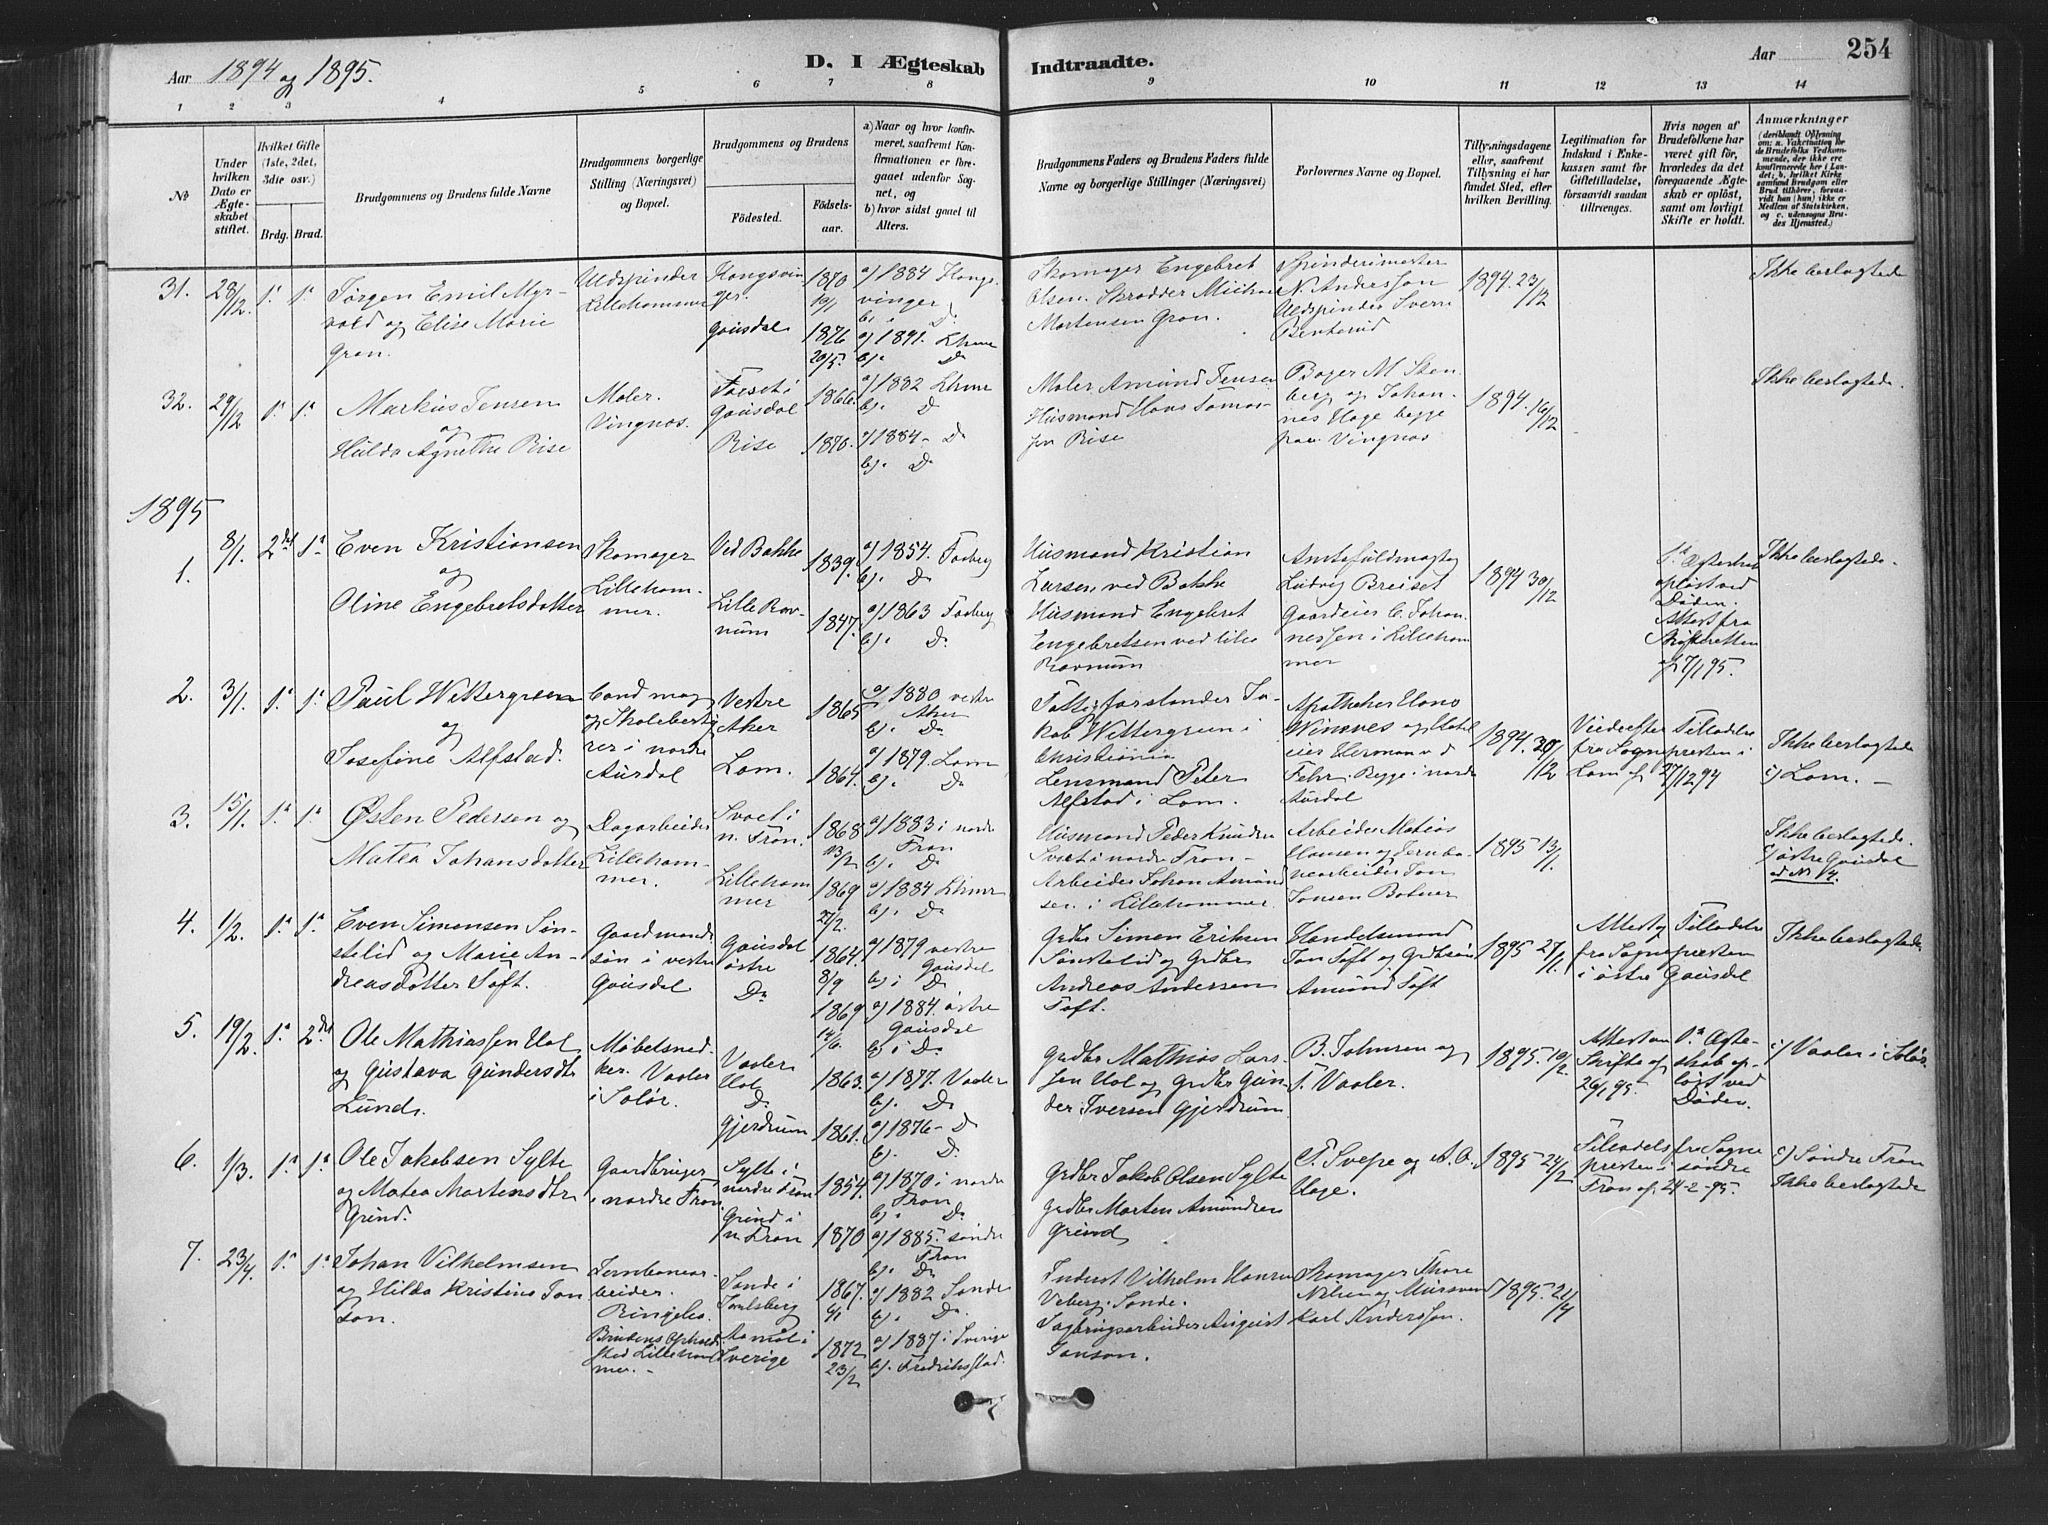 SAH, Fåberg prestekontor, Ministerialbok nr. 10, 1879-1900, s. 254